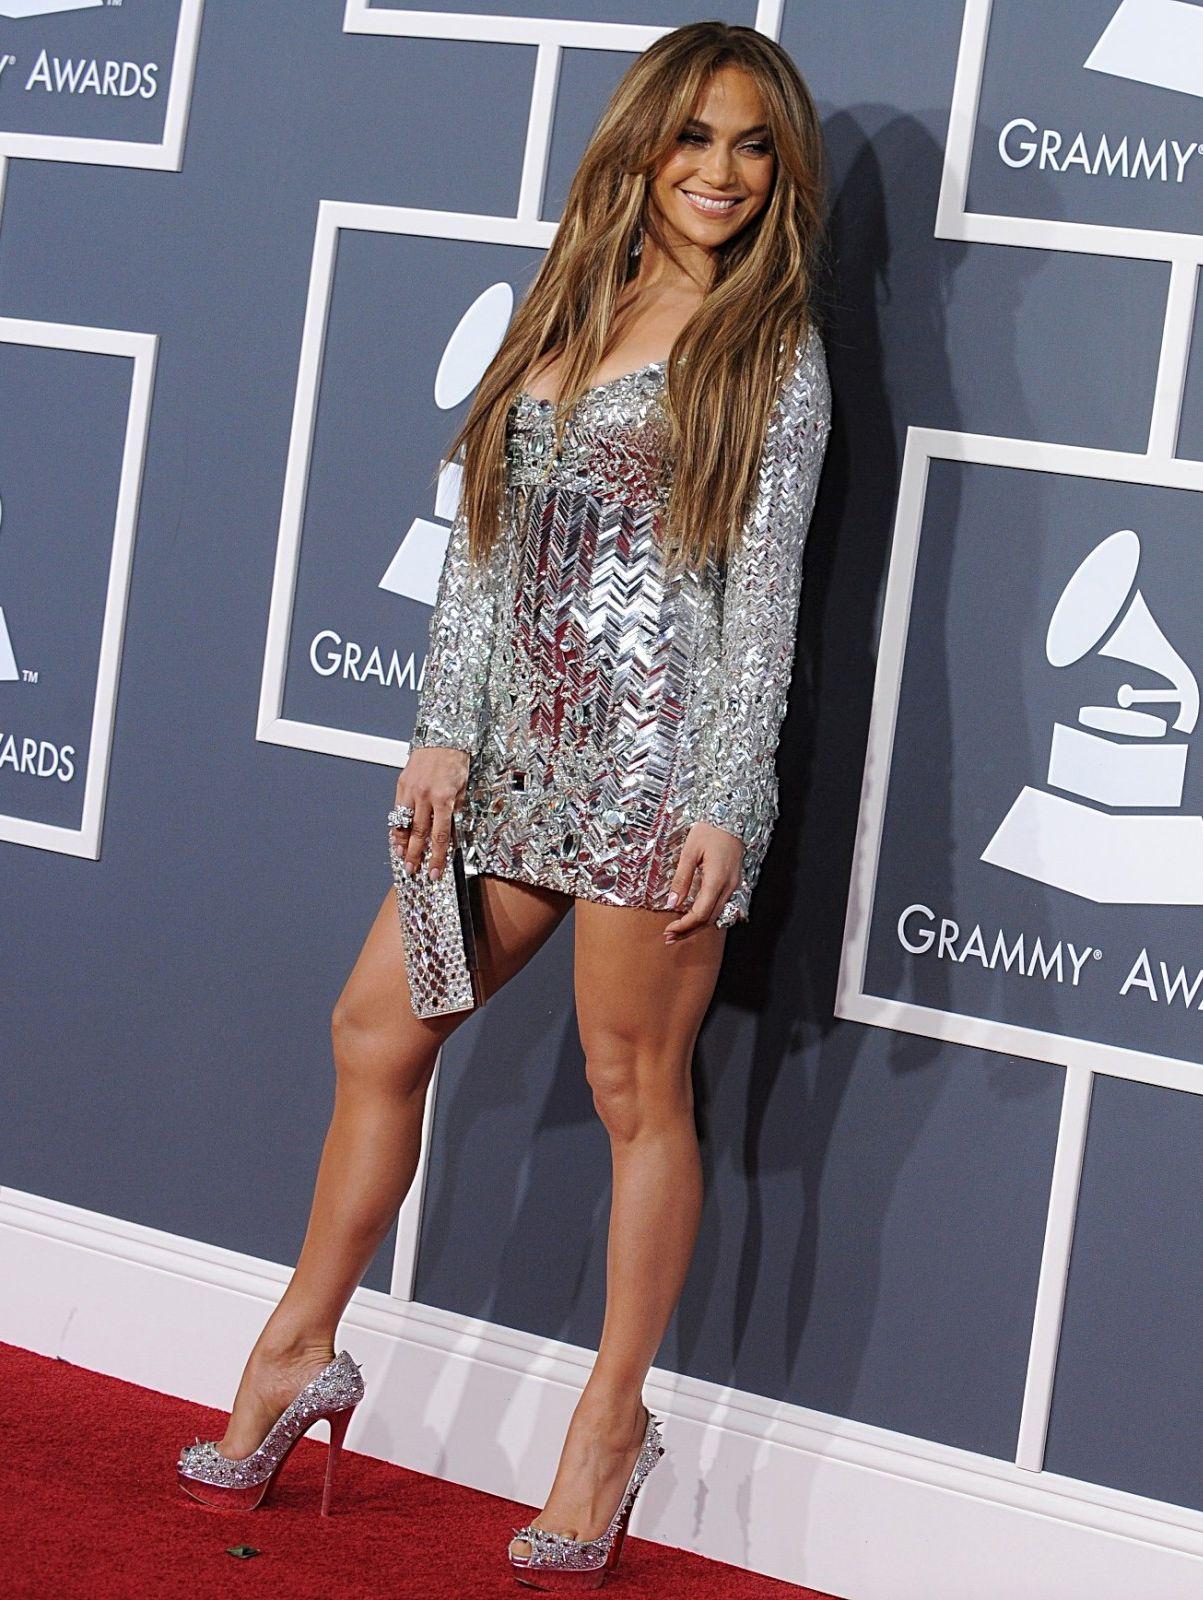 http://1.bp.blogspot.com/-9IrFzEI4PAk/UC8EBqvlQxI/AAAAAAAADzs/5fh7LSiRw4o/s1600/Jennifer+Lopez+Grammy+(10).jpg